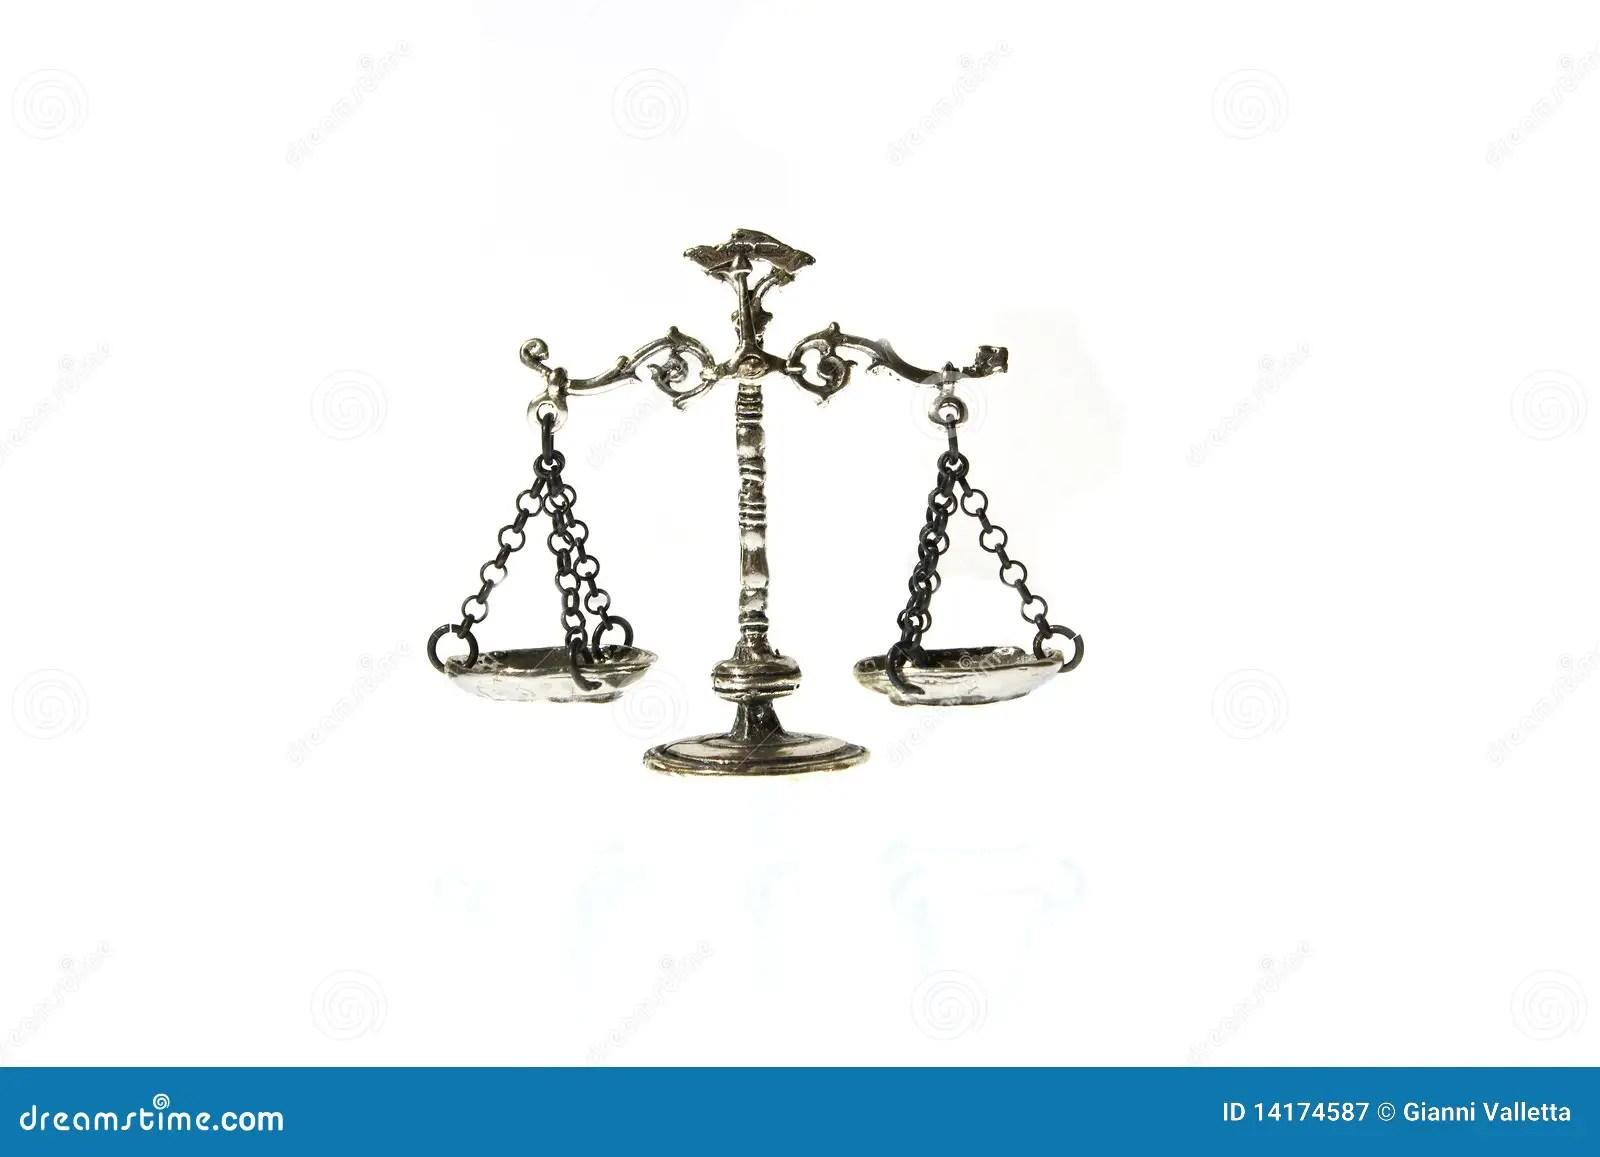 Vintage Scale Balance Over White Background Stock Image